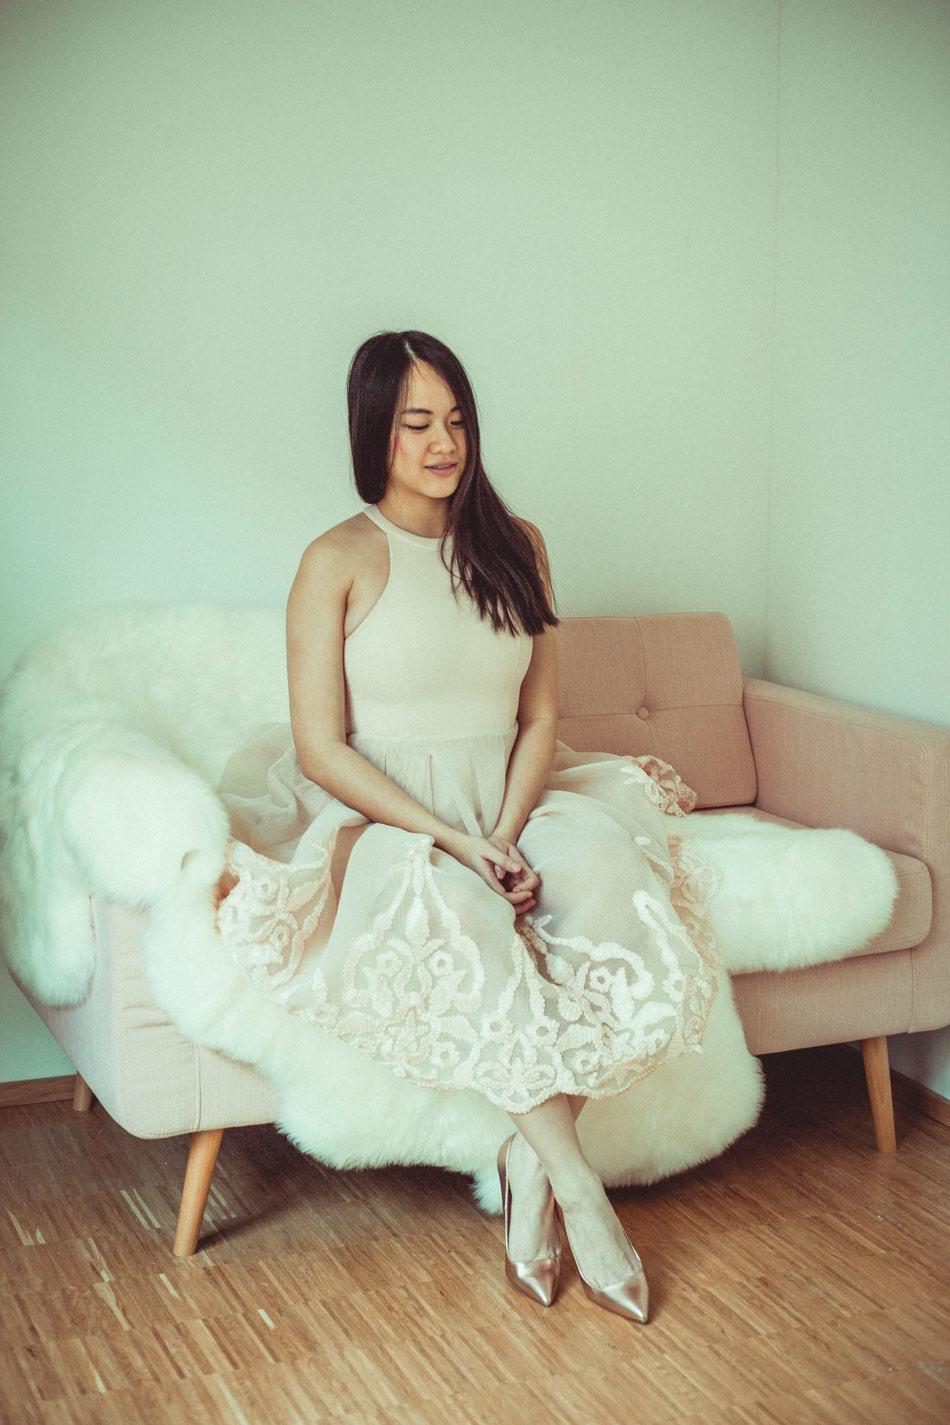 Asos-Rosa-Kleid-Bonbonkleid-Deichmann-Silvie-Meiss-Heels-Rosegold-(12)